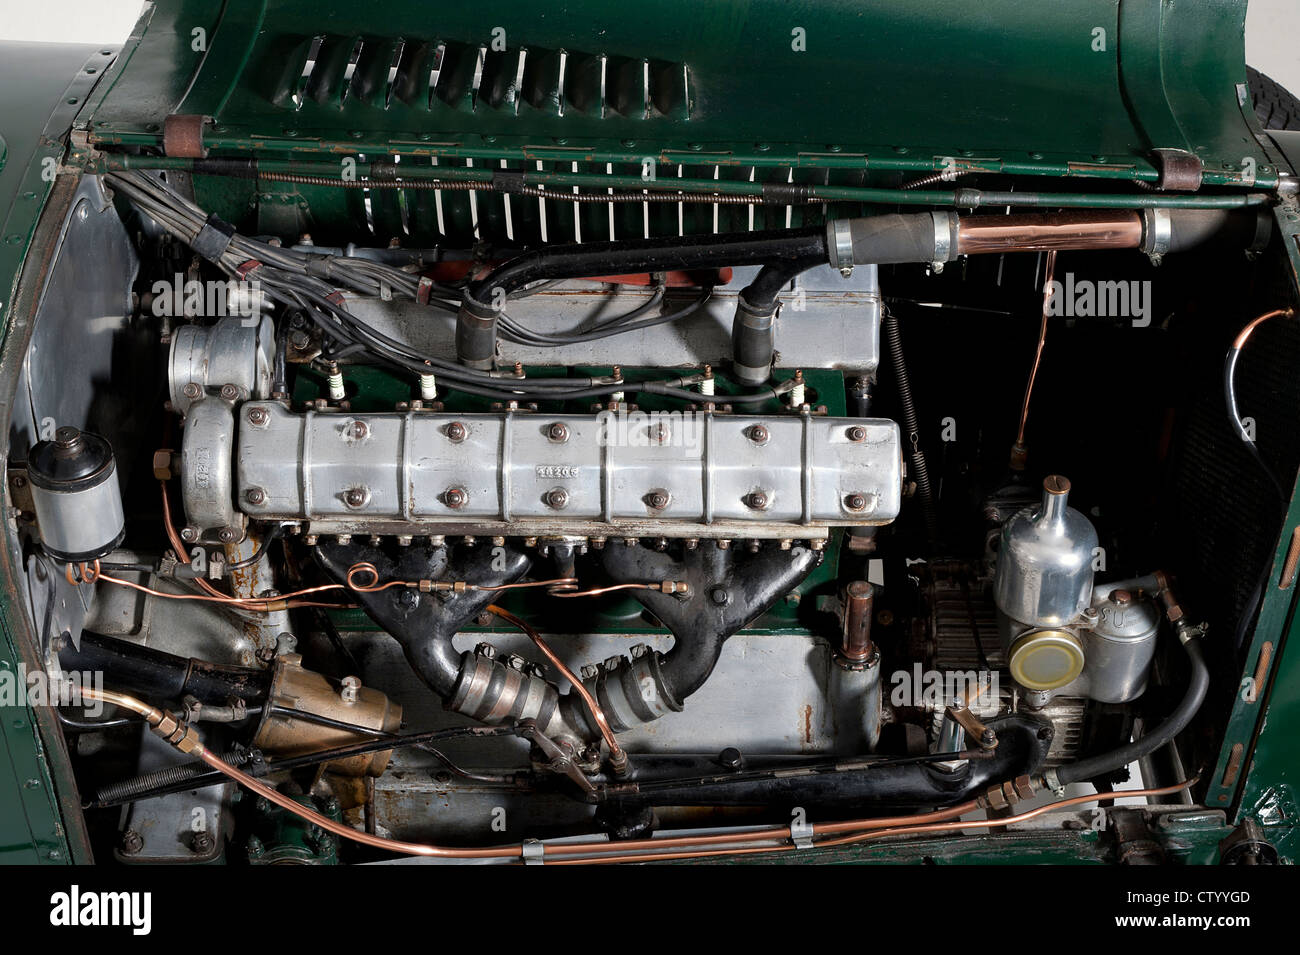 Sunbeam Cub 2 litre 1924 engine - Stock Image